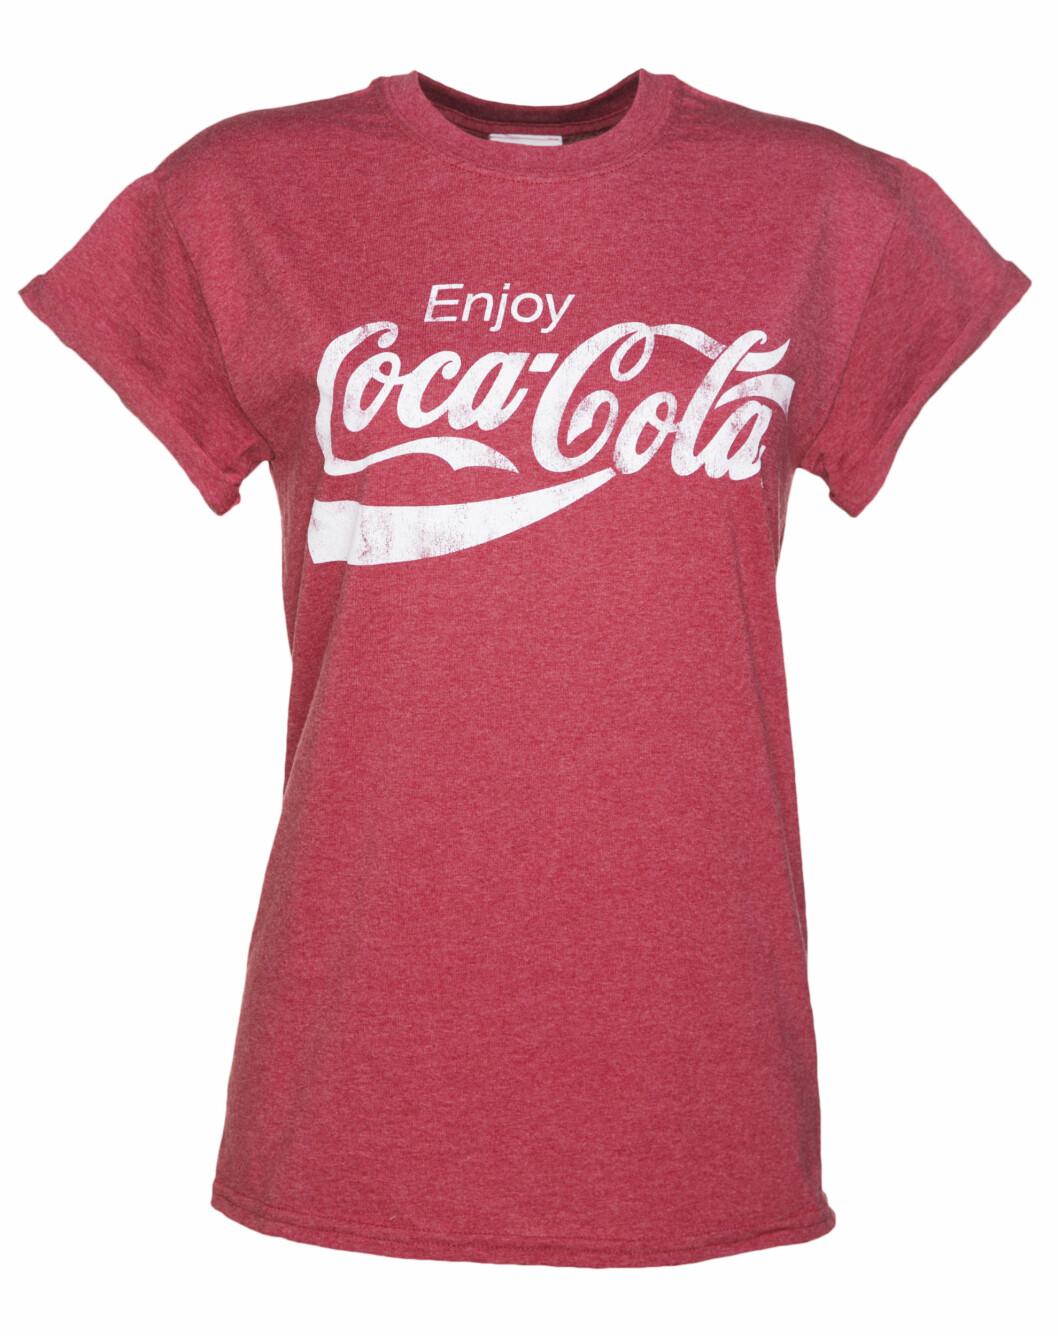 <strong>Coca Cola t-skjorte | kr 100 | https:</strong>//www.amazon.com/Coca-Cola-Classic-Coke-T-shirt/dp/B00EG0FPFU/ref=cts_ap_3_vtp?pf_rd_m=ATVPDKIKX0DER&pf_rd_p=2601945442&pf_rd_r=3DAYMVCQ74HPQ8BQM8PE&pd_rd_wg=8HbMs&pf_rd_s=desktop-detail-softlines&pf_rd_t=40701&pd_rd_i=B00EG0FPFU&pd_rd_w=jjiEu&pf_rd_i=desktop-detail-softlines&pd_rd_r=3DAYMVCQ74HPQ8BQM8PE&_encoding=UTF8